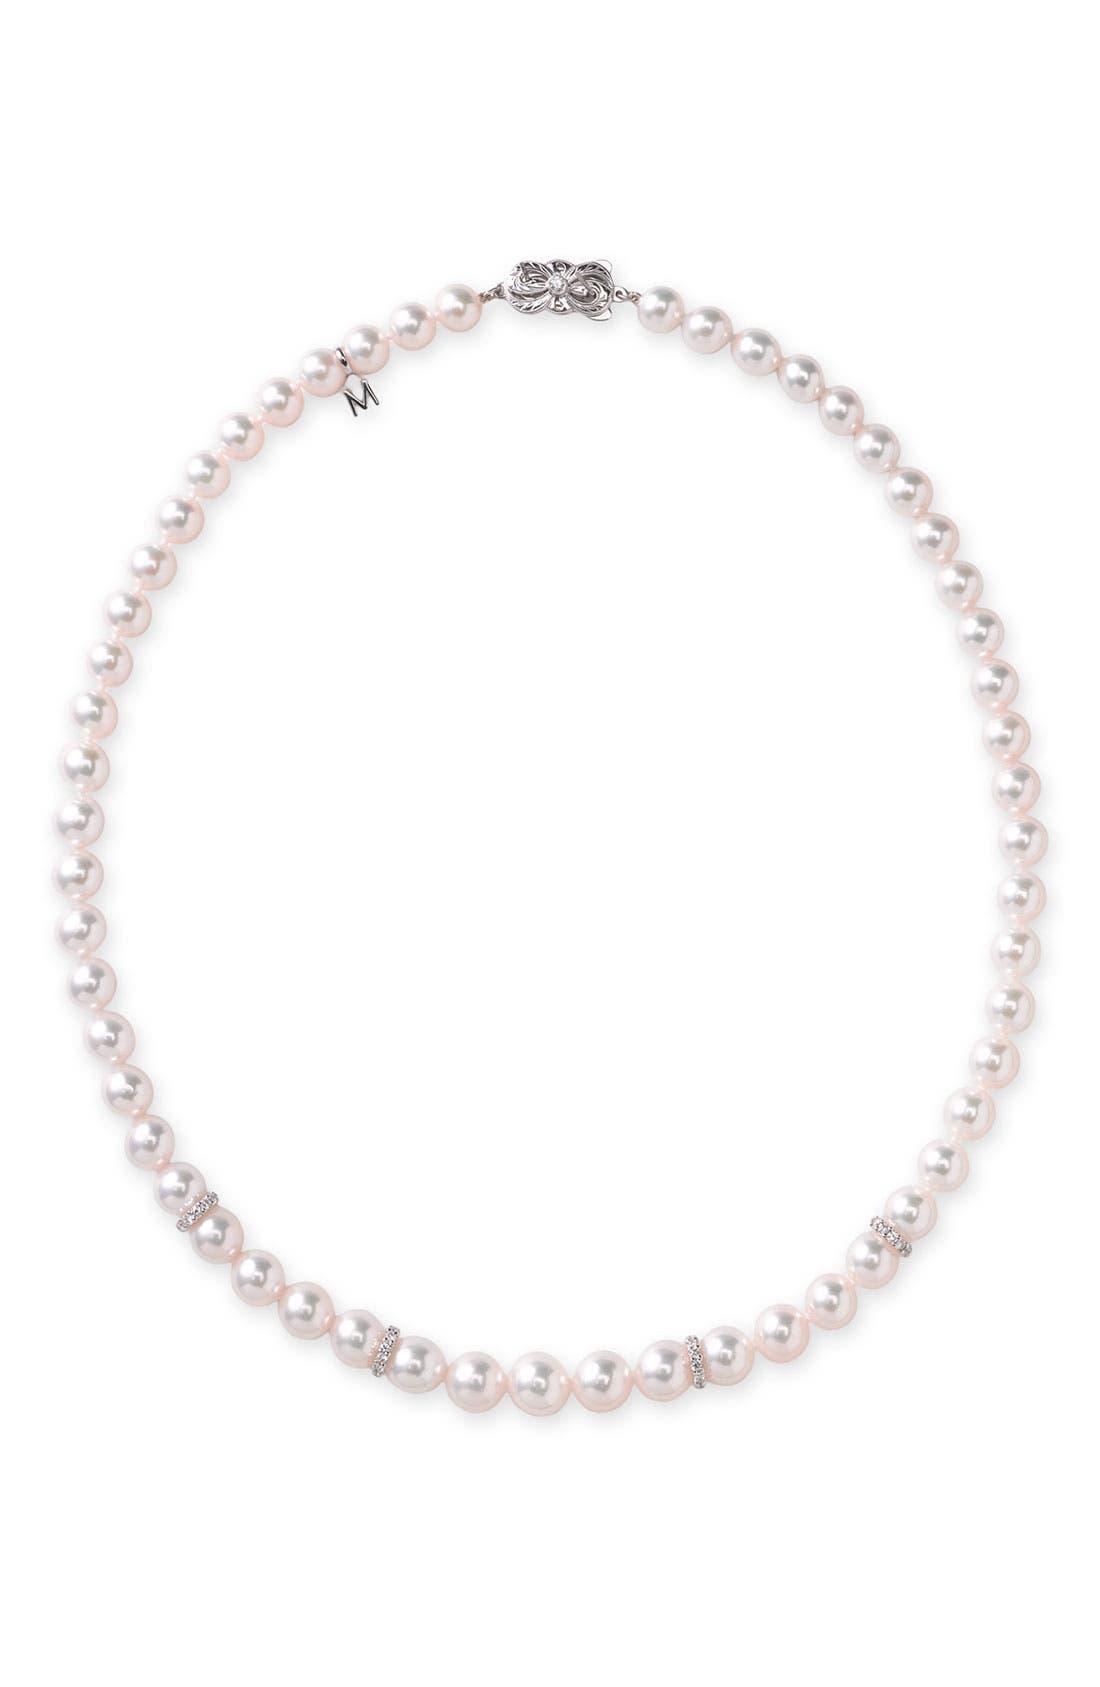 MIKIMOTO DIAMOND & PEARL NECKLACE